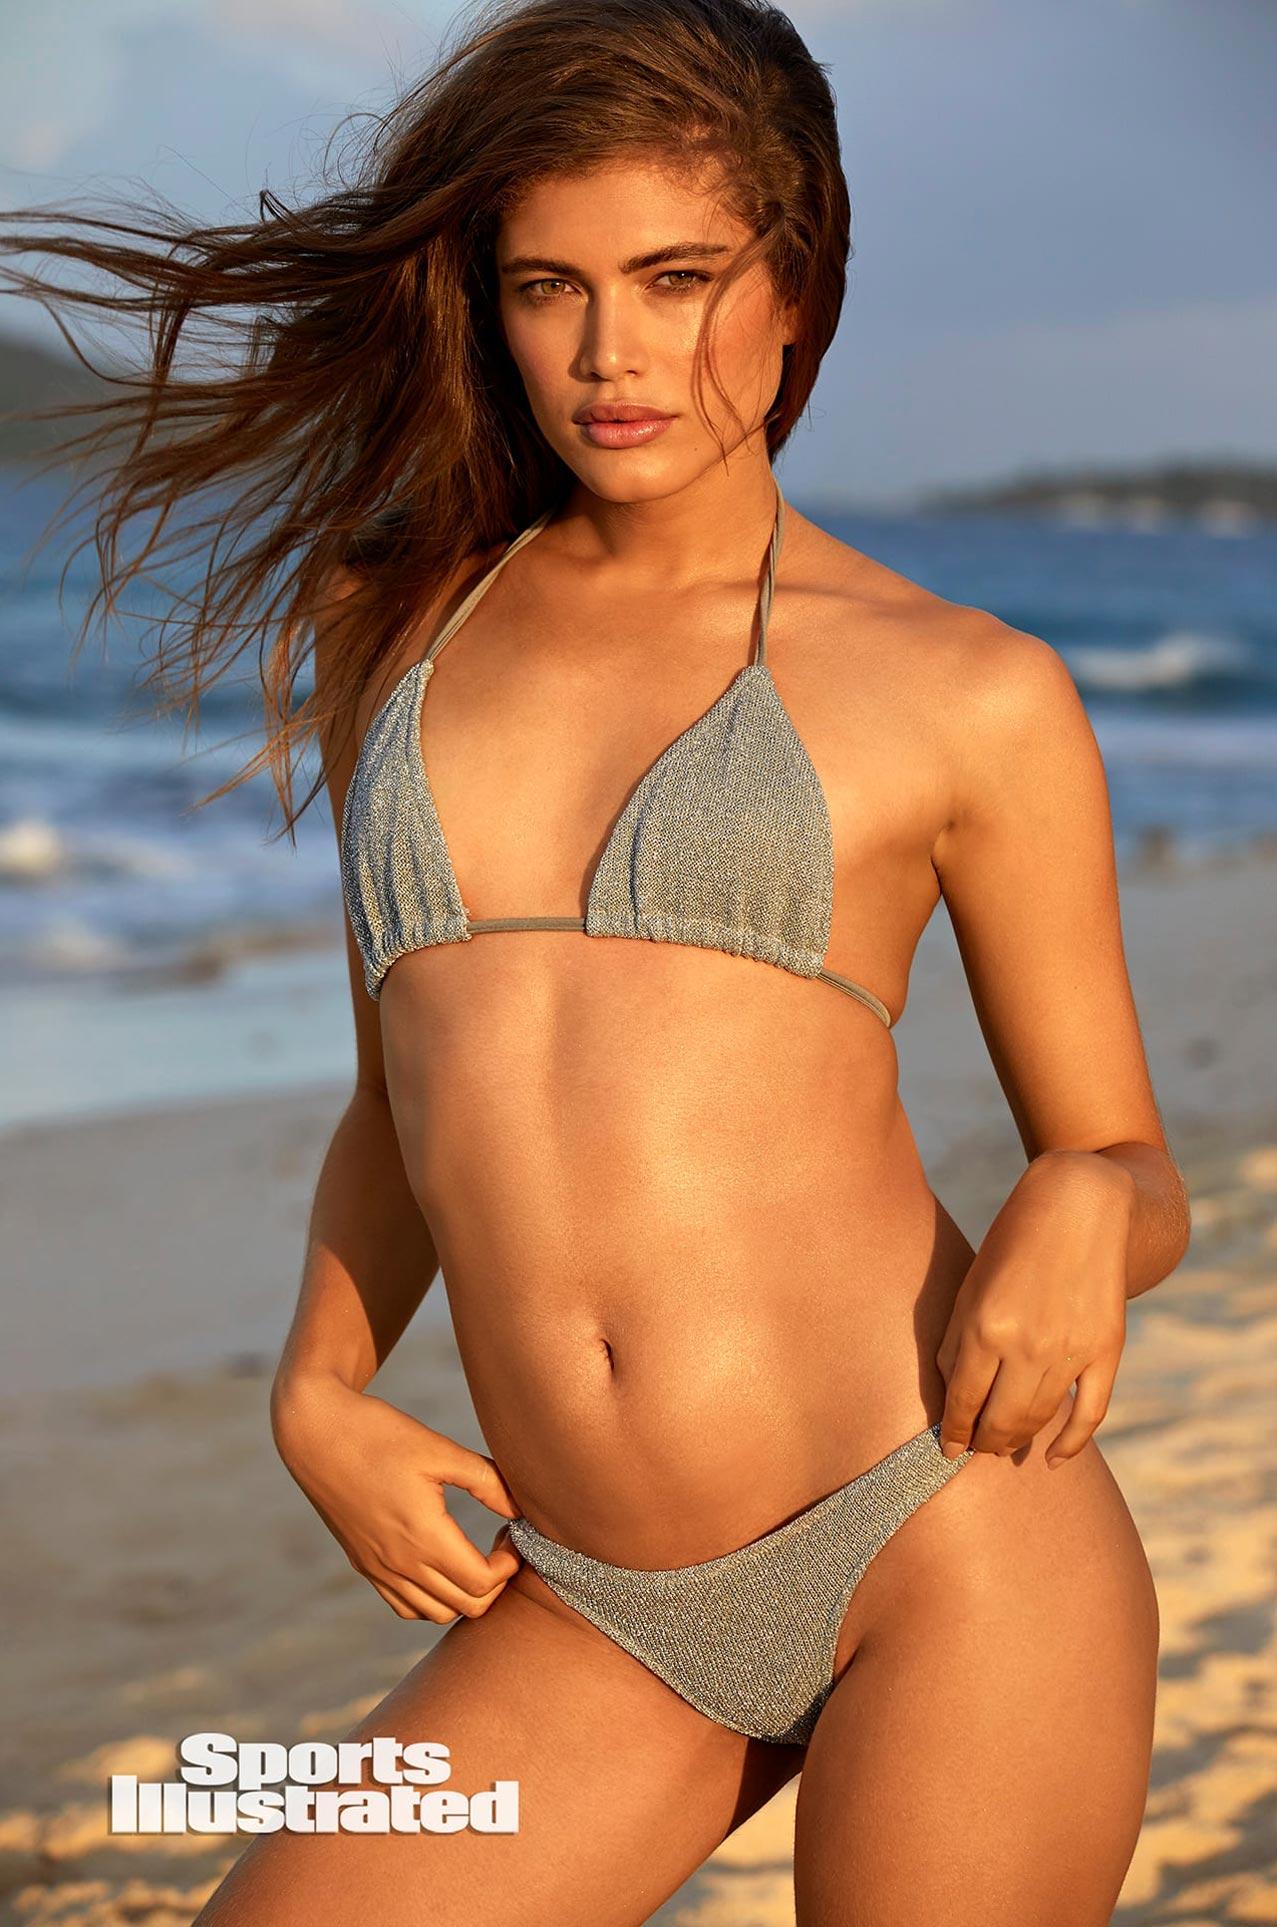 Валентина Сампайо в каталоге купальников Sports Illustrated Swimsuit 2020 / фото 13